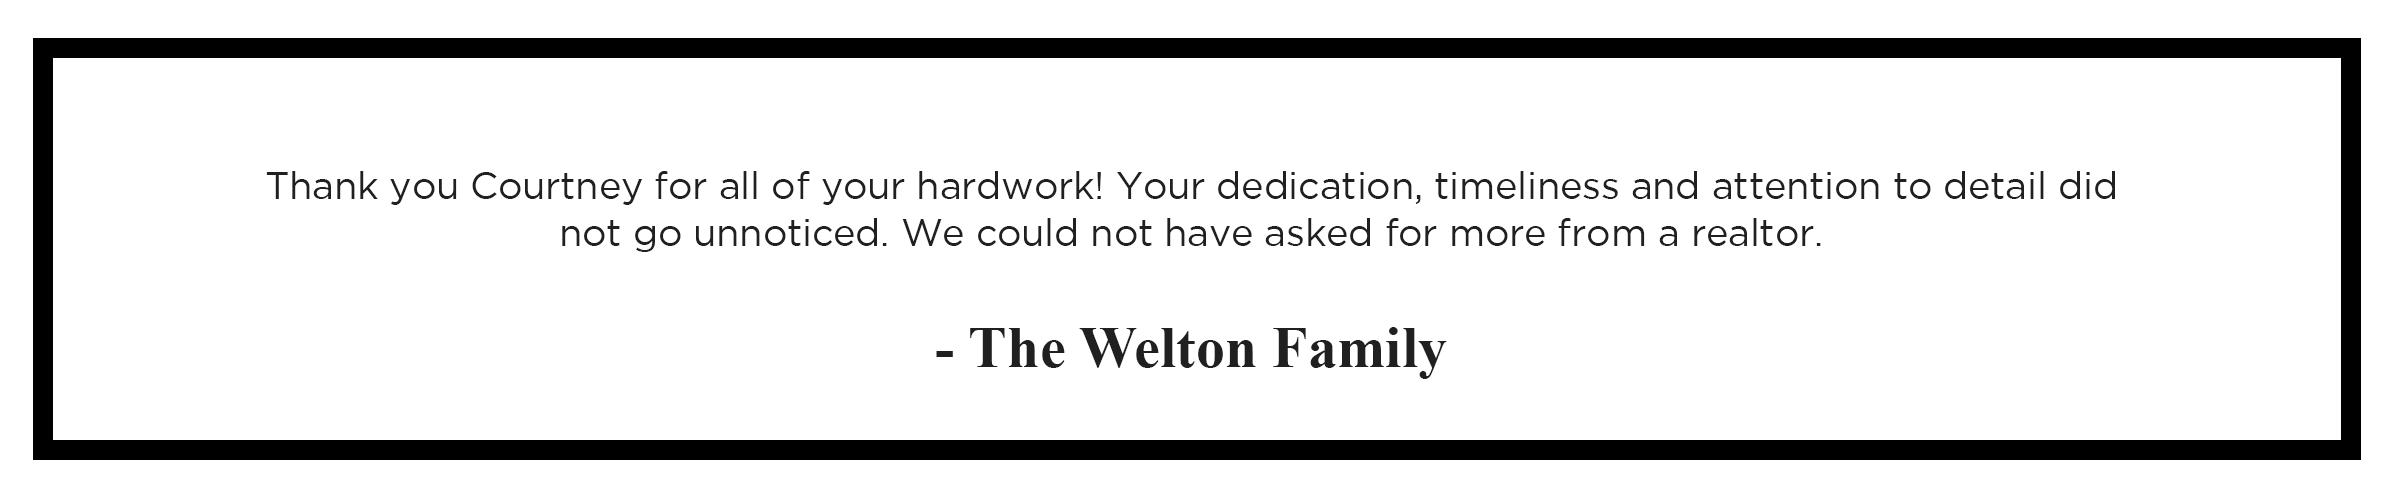 02 - the welton family